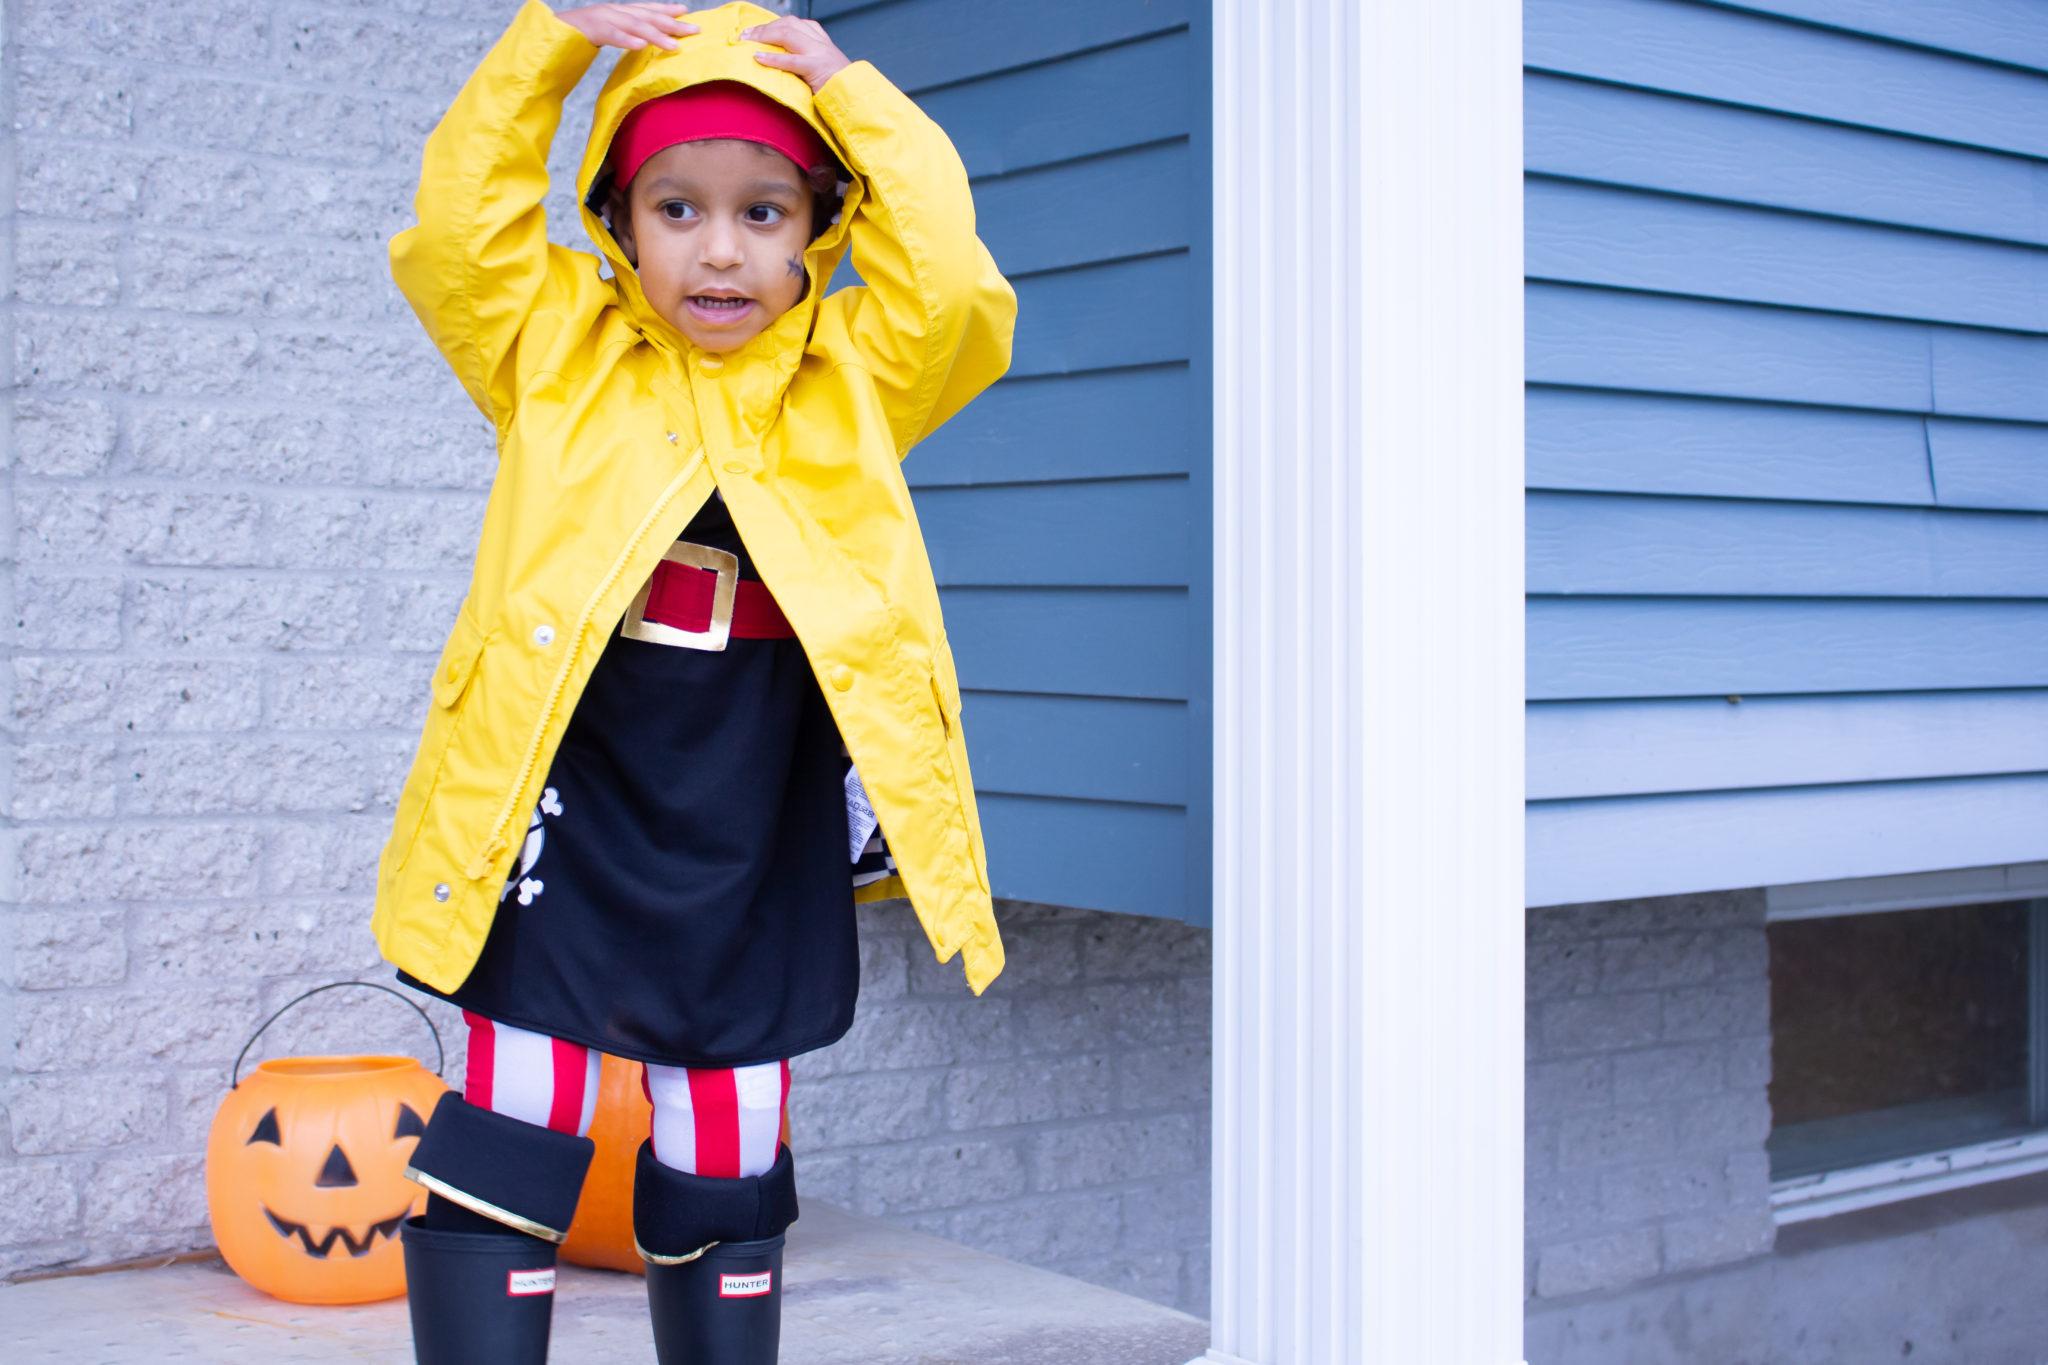 Trick-or-treat | Mandatory Halloween Post